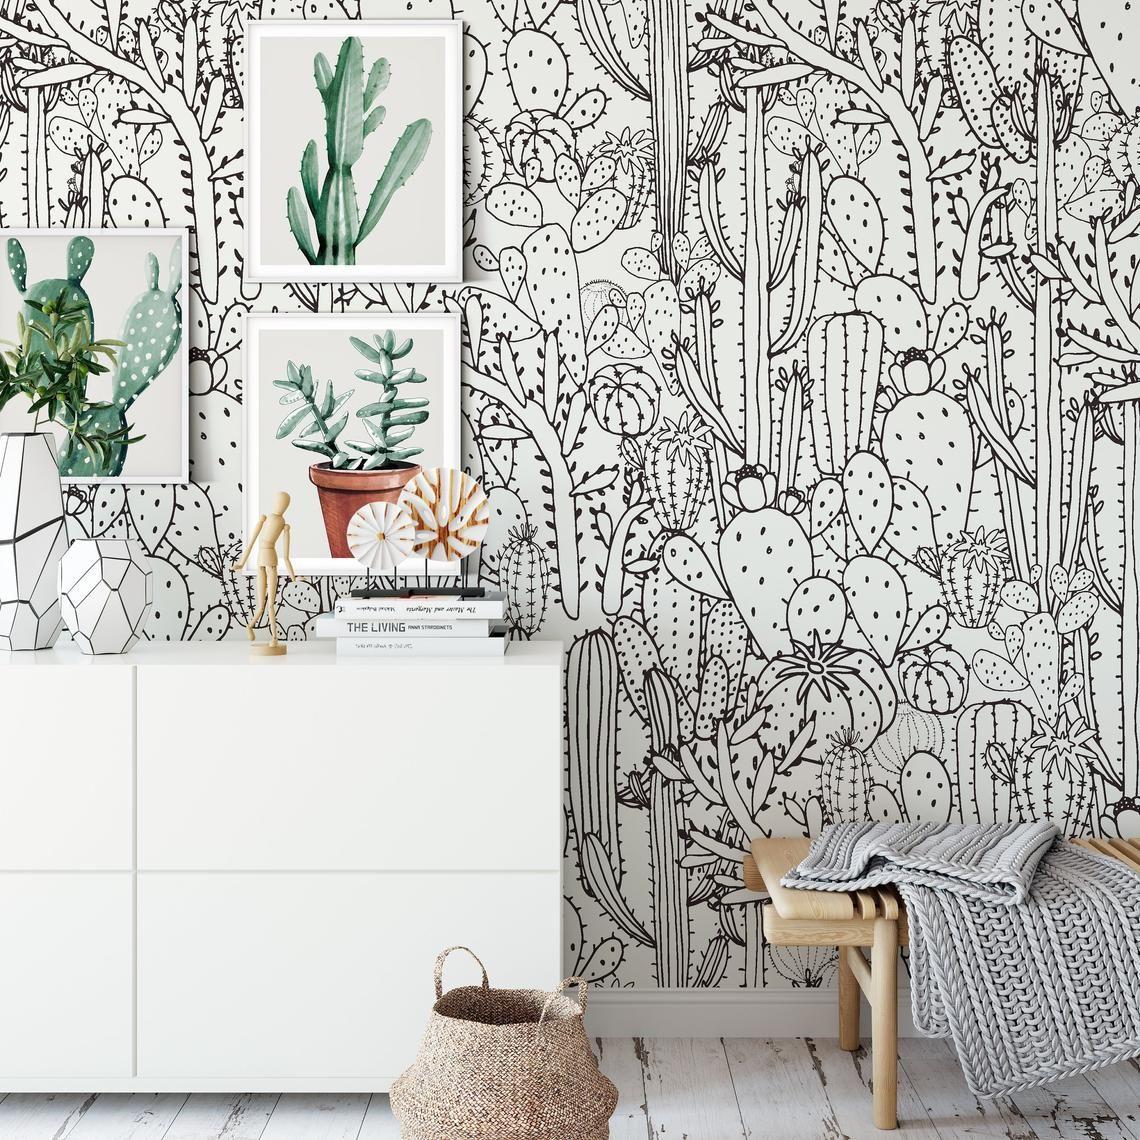 Cactus Wallpaper Botanical Black And White Southwestern Boho Etsy Removable Wallpaper Bedroom Removable Wallpaper Wall Colors